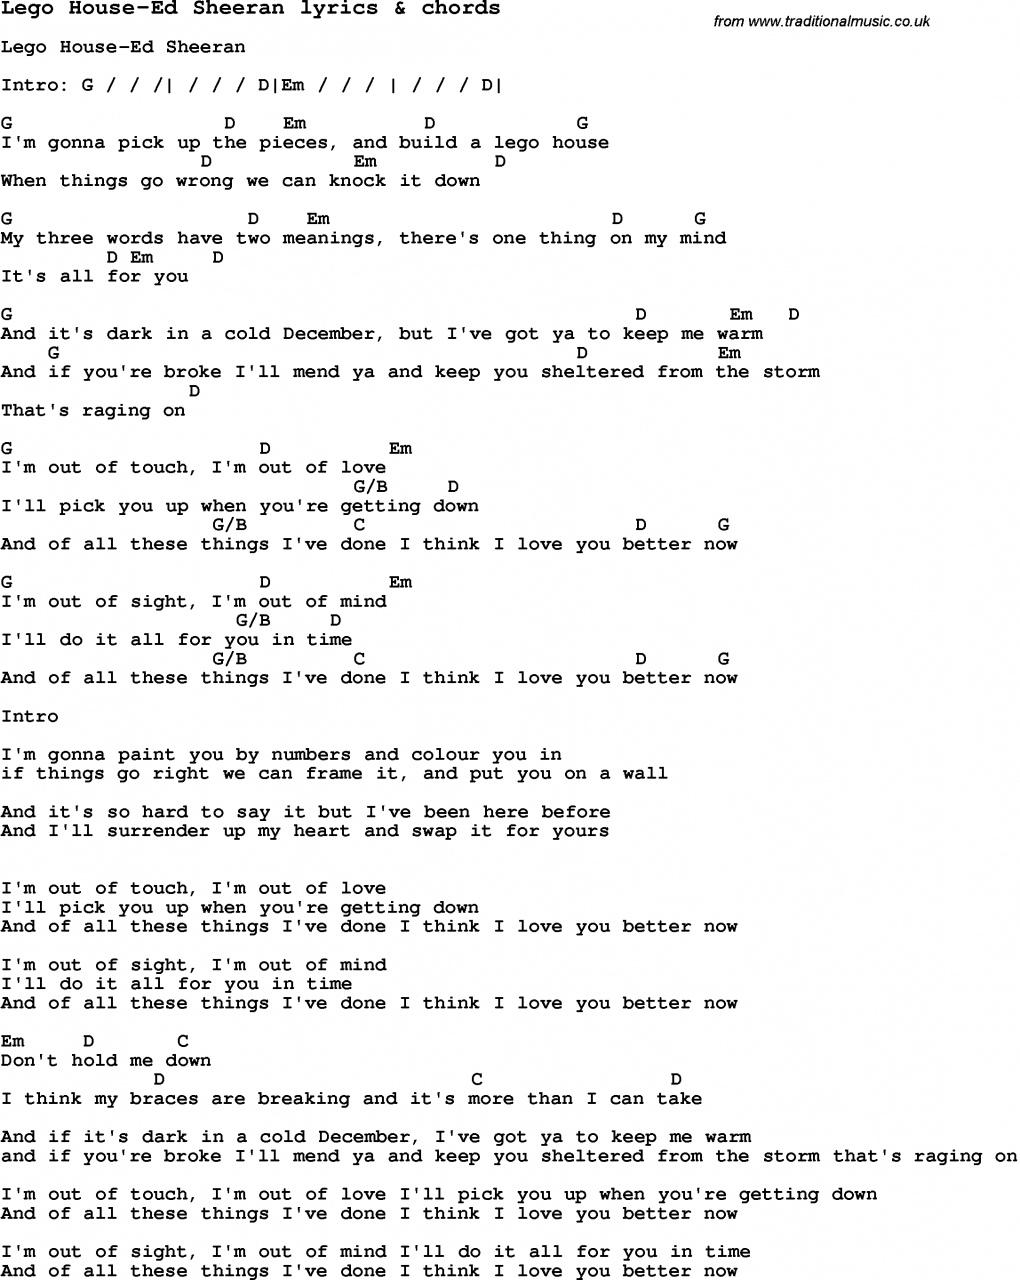 Kiss Me Chords Kiss Me Ed Sheeran Guitar Chords Mouhab Dakhil Dakhilmouhab On